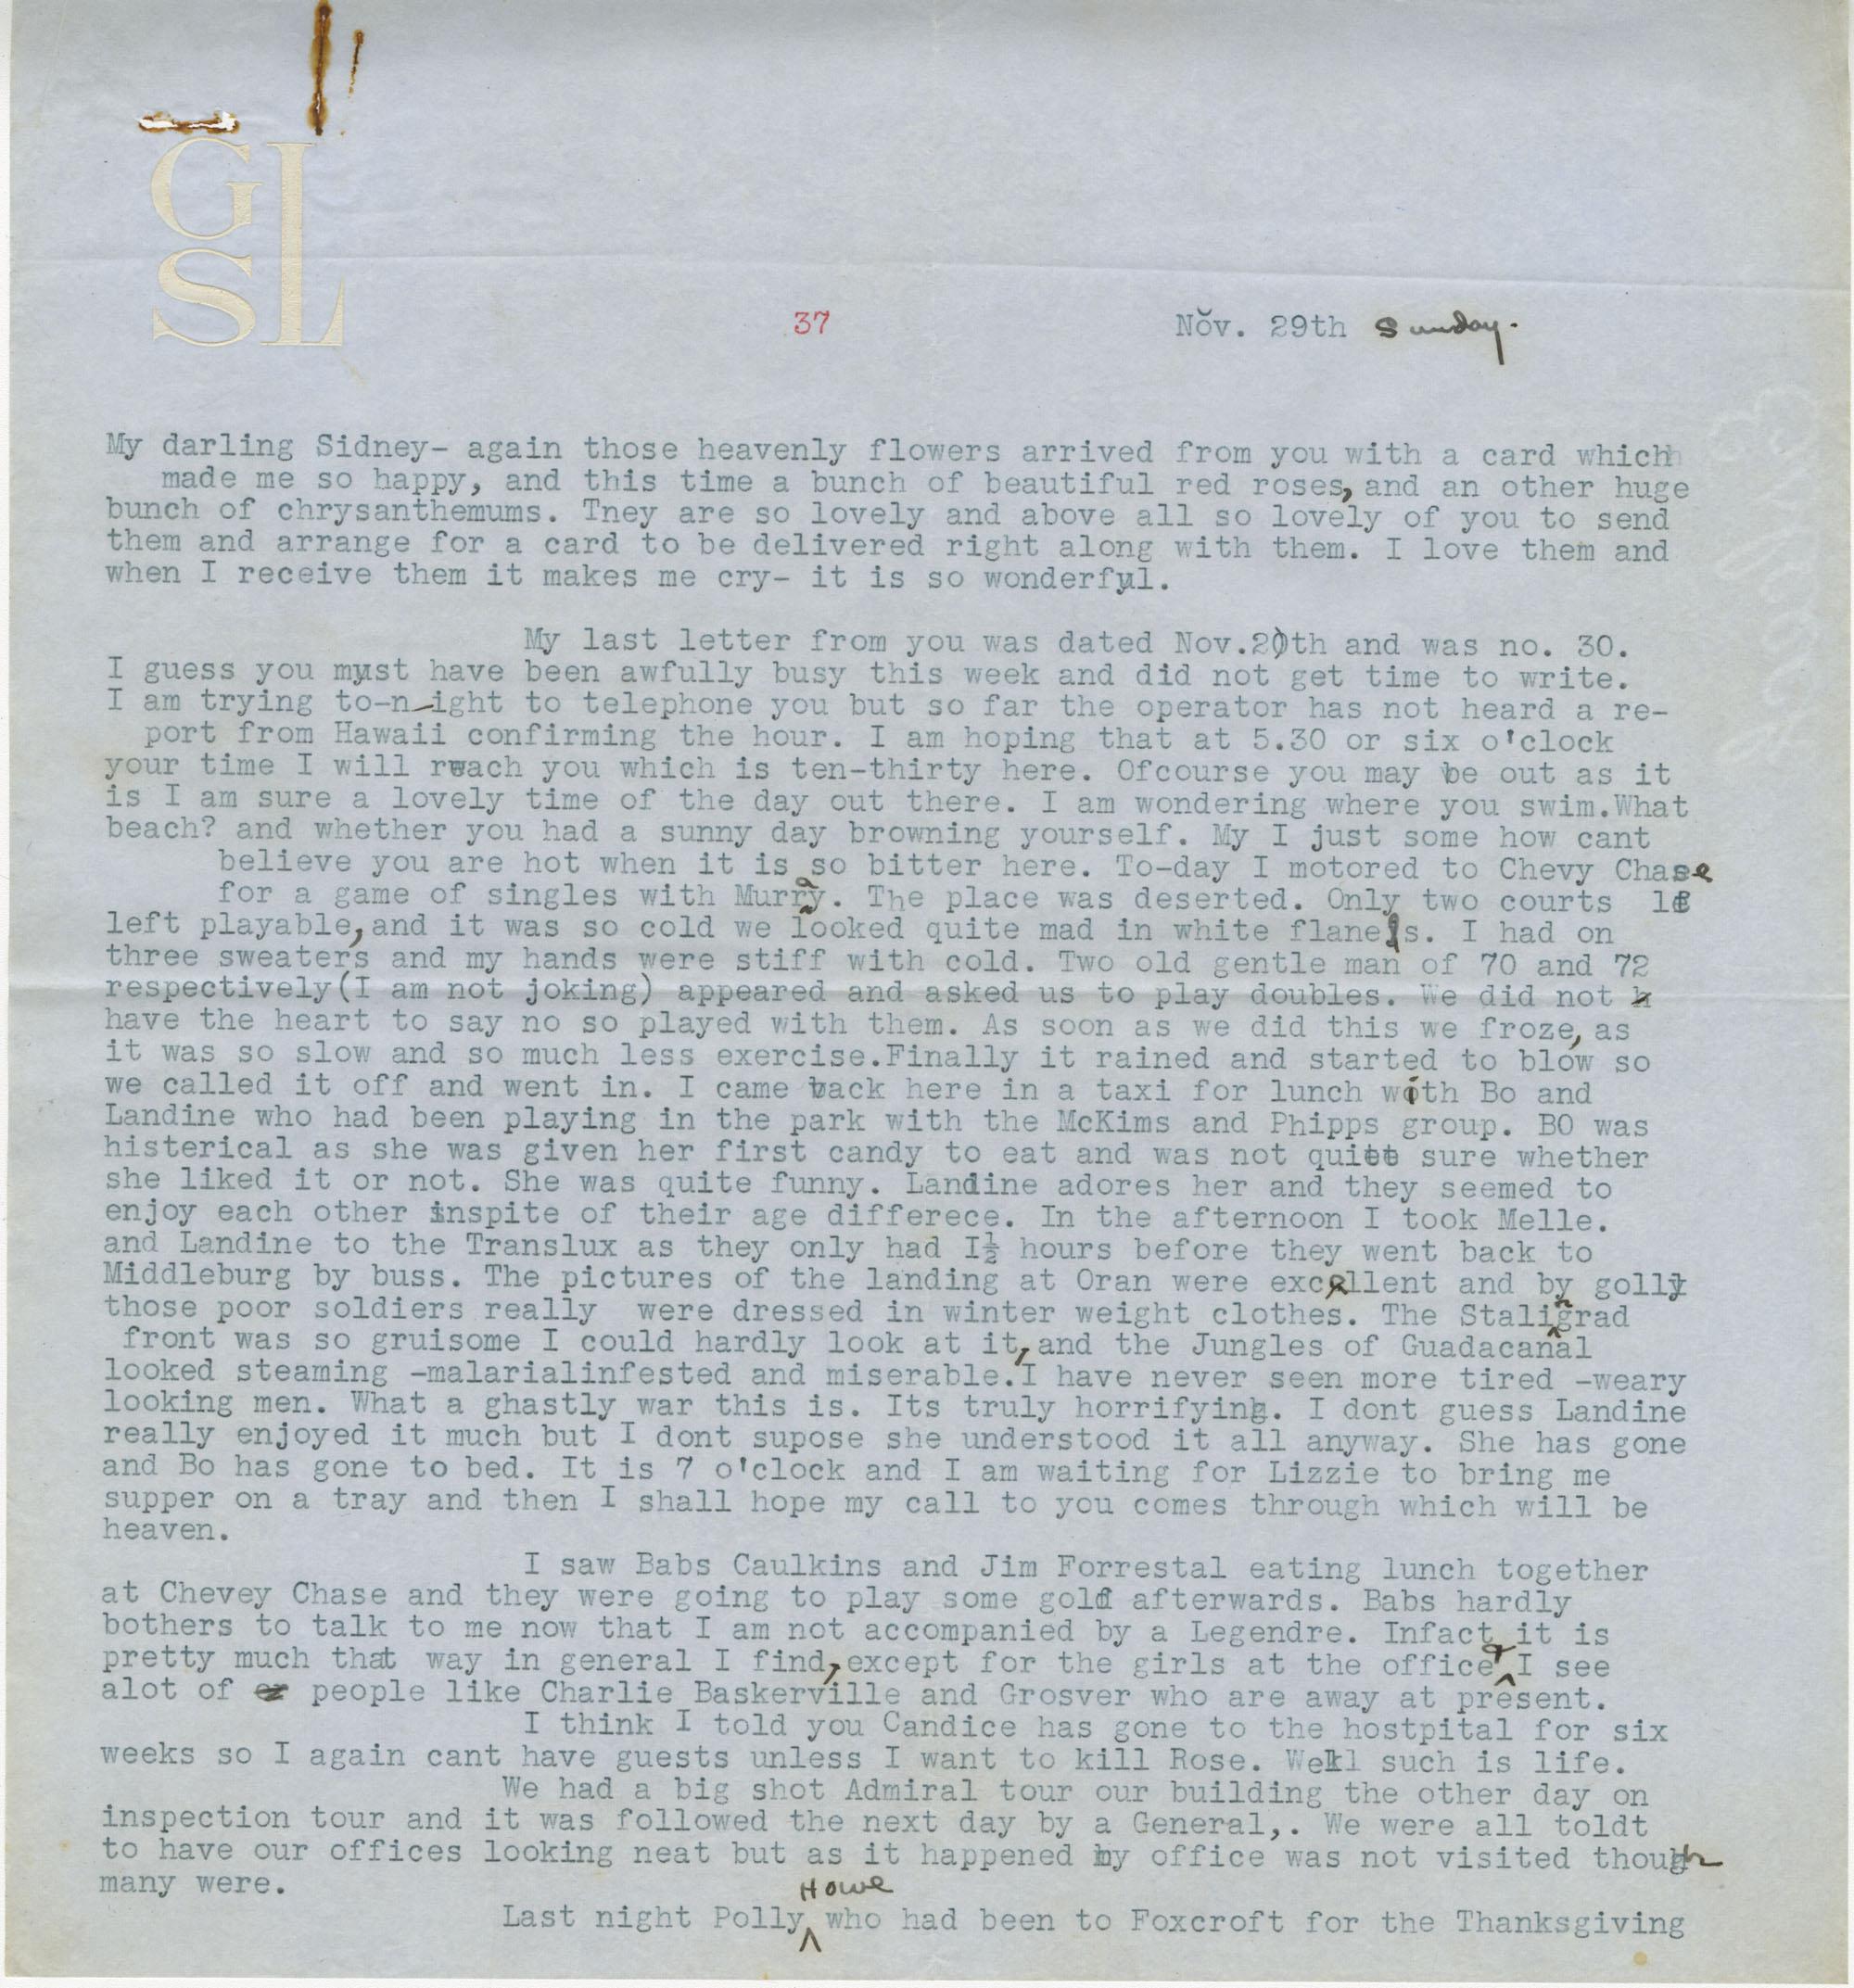 Letter from Gertrude Sanford Legendre, November 29, 1942